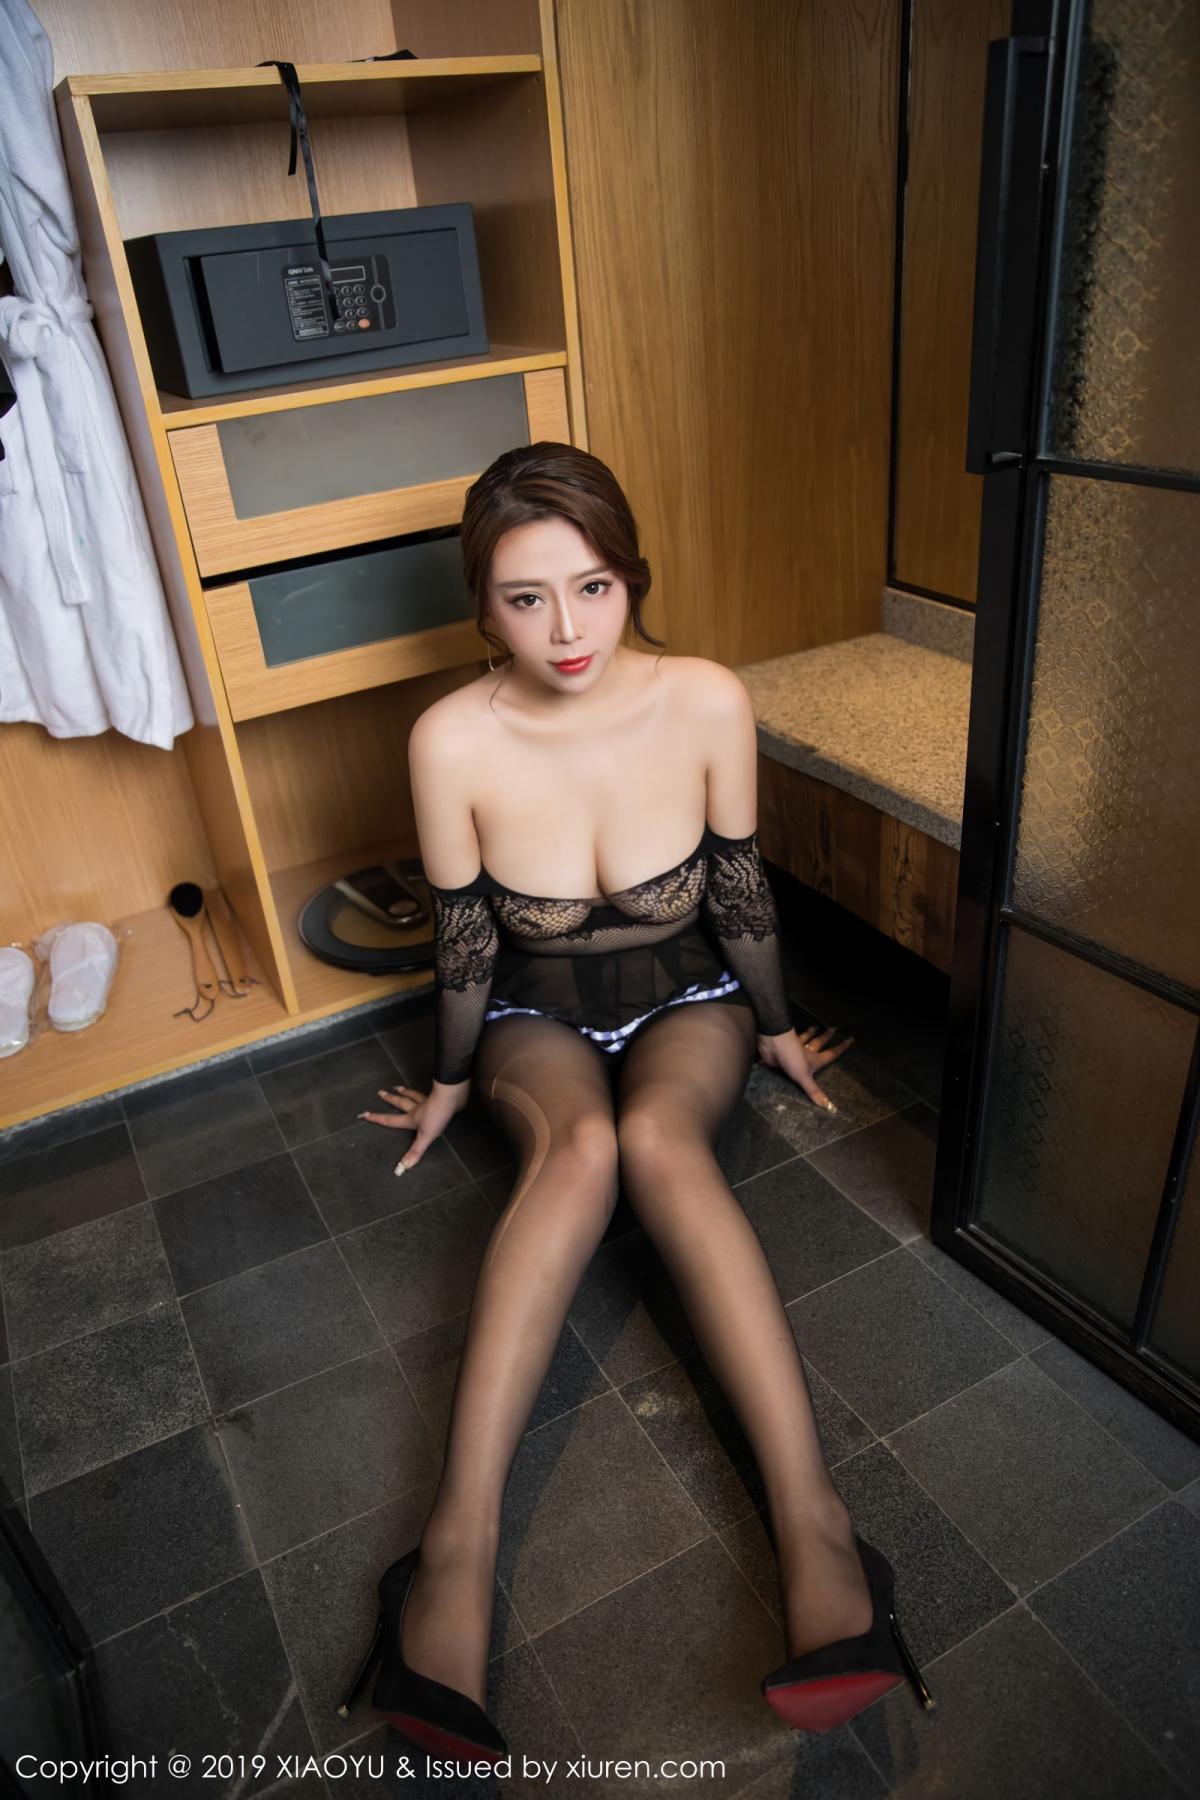 [XiaoYu] Vol.016 Miki Tu 24P, Miki Tu, Tall, XiaoYu